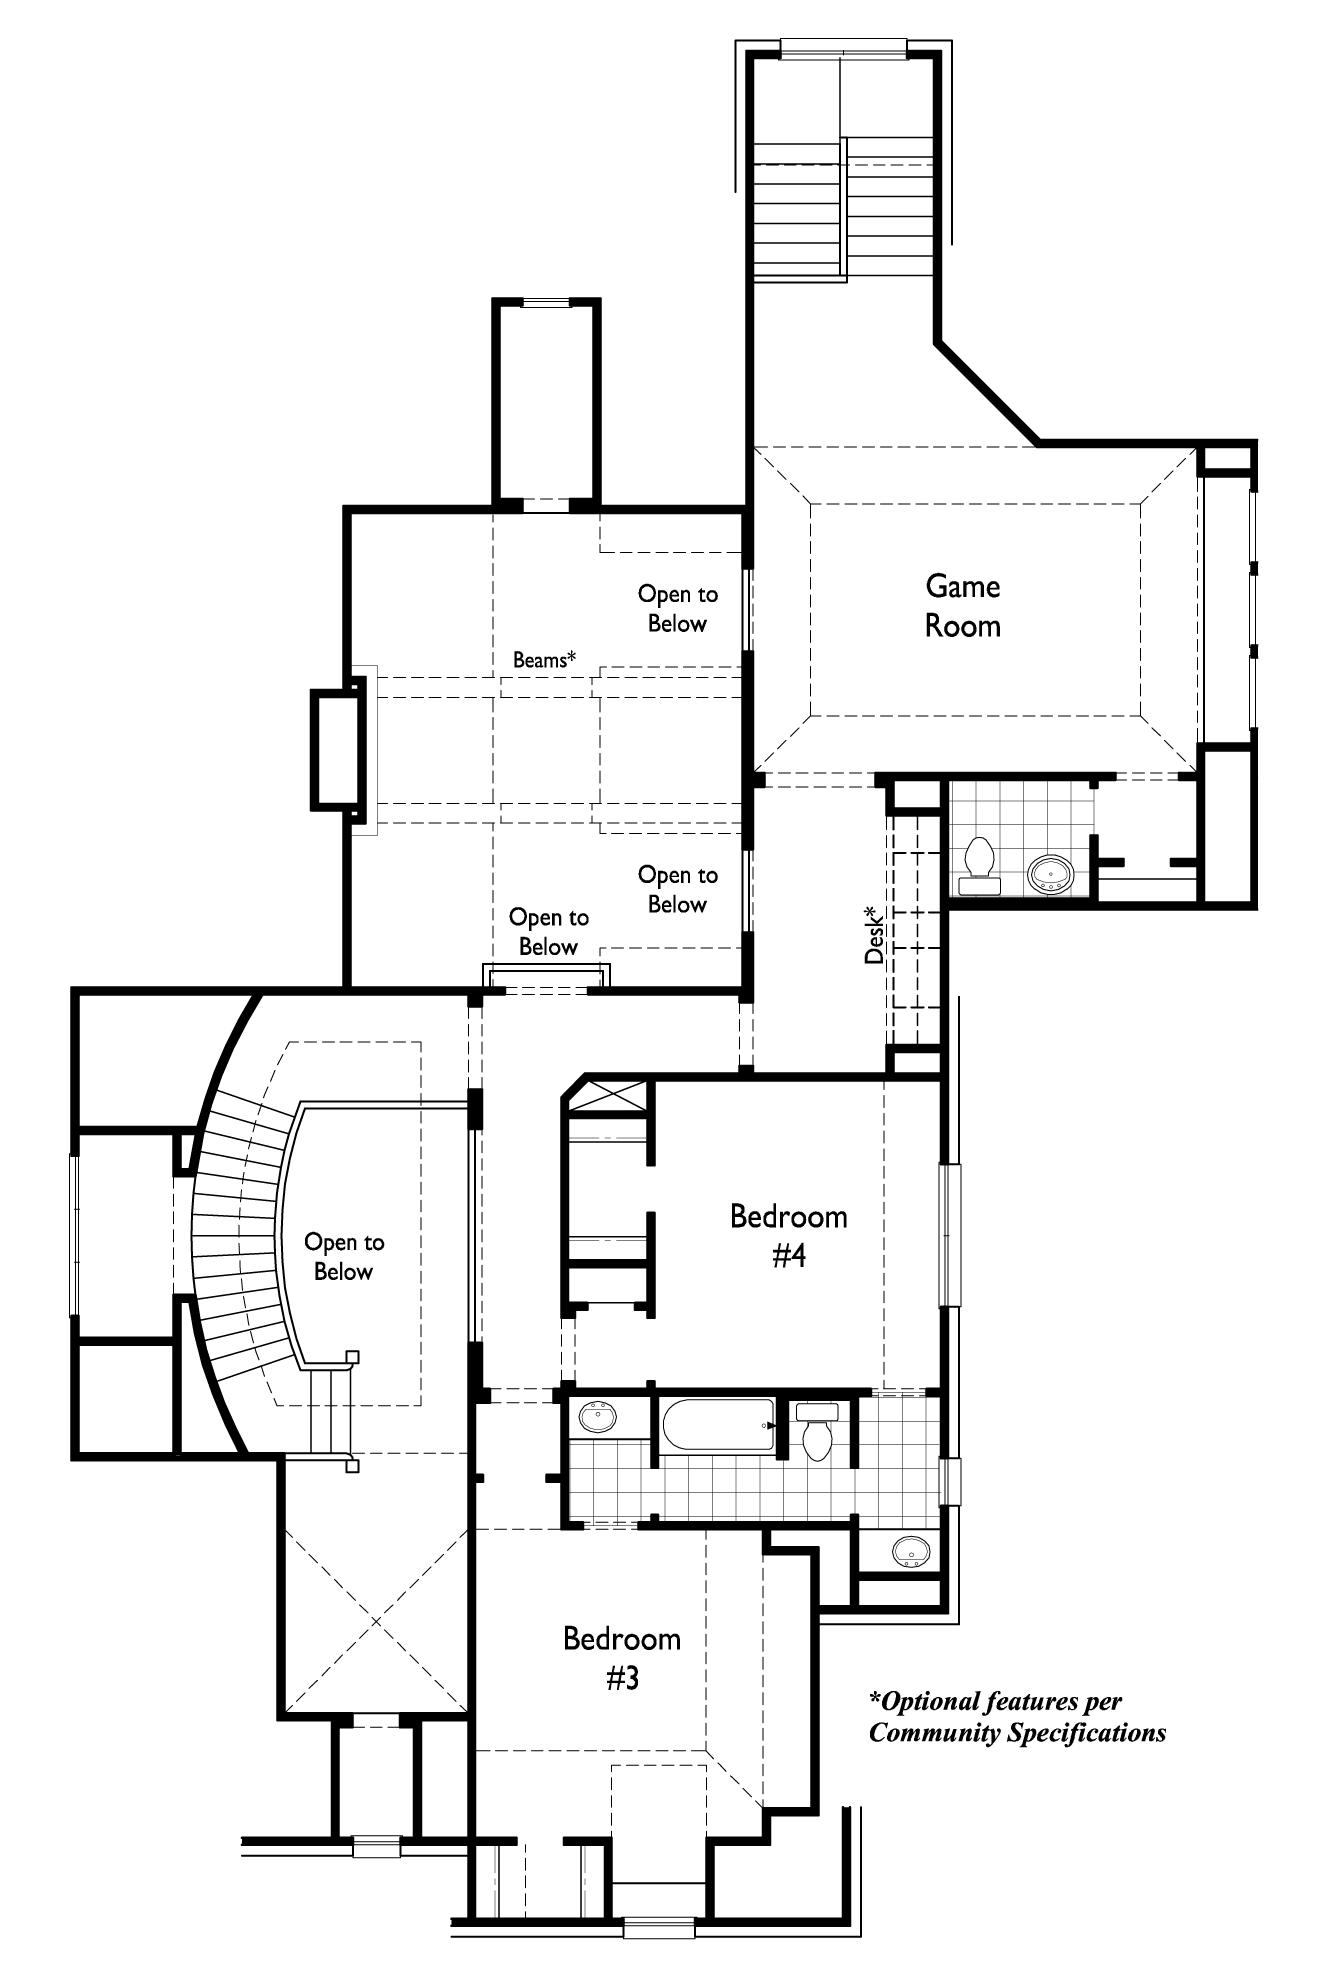 New Home Plan 3970 in Prosper, TX 75078